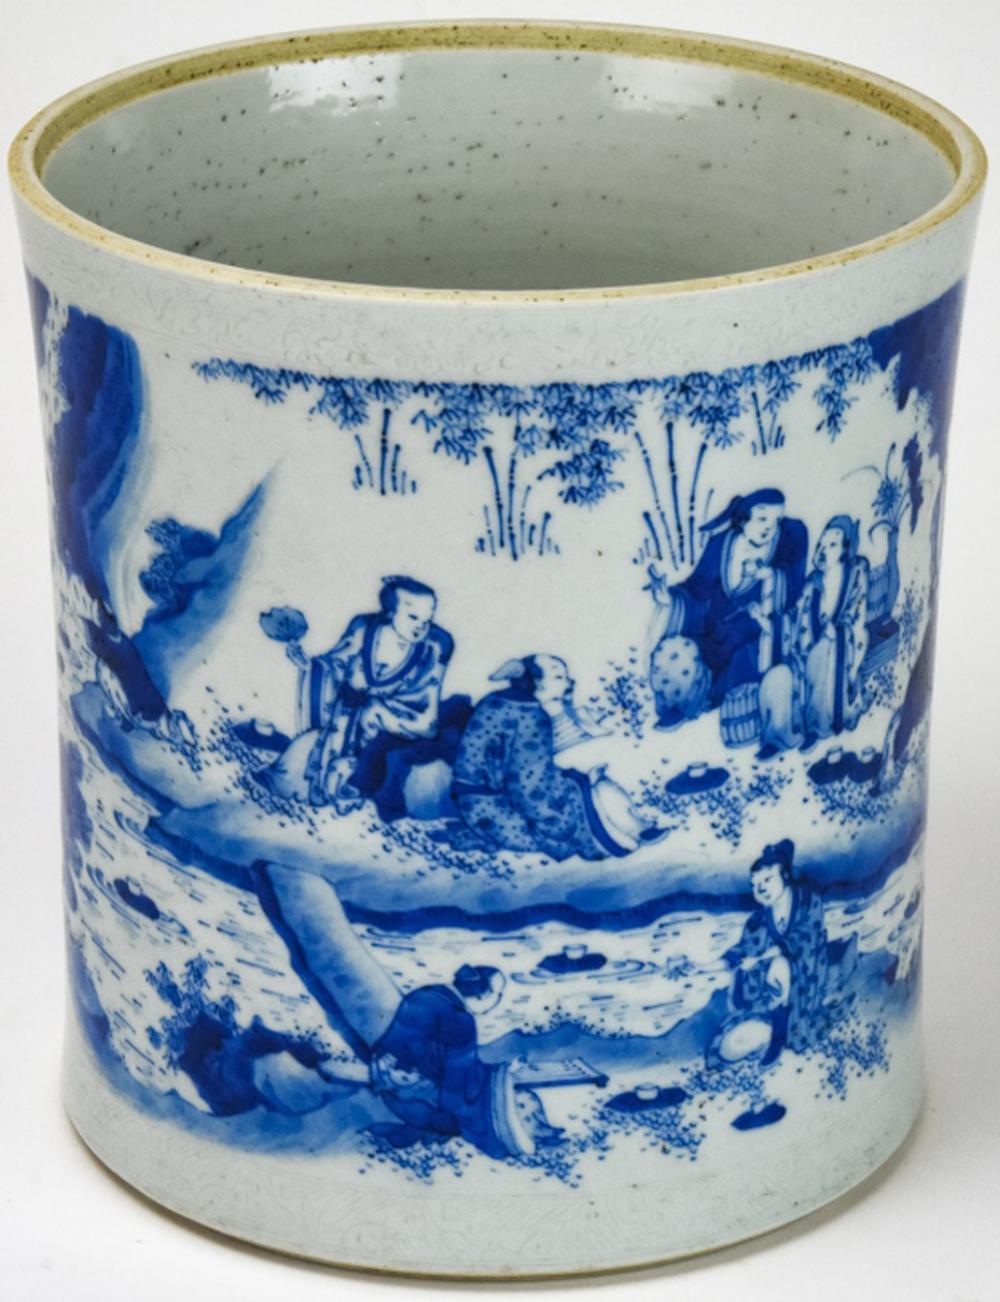 Antique Chinese Blue & White Porcelain Brush Pot